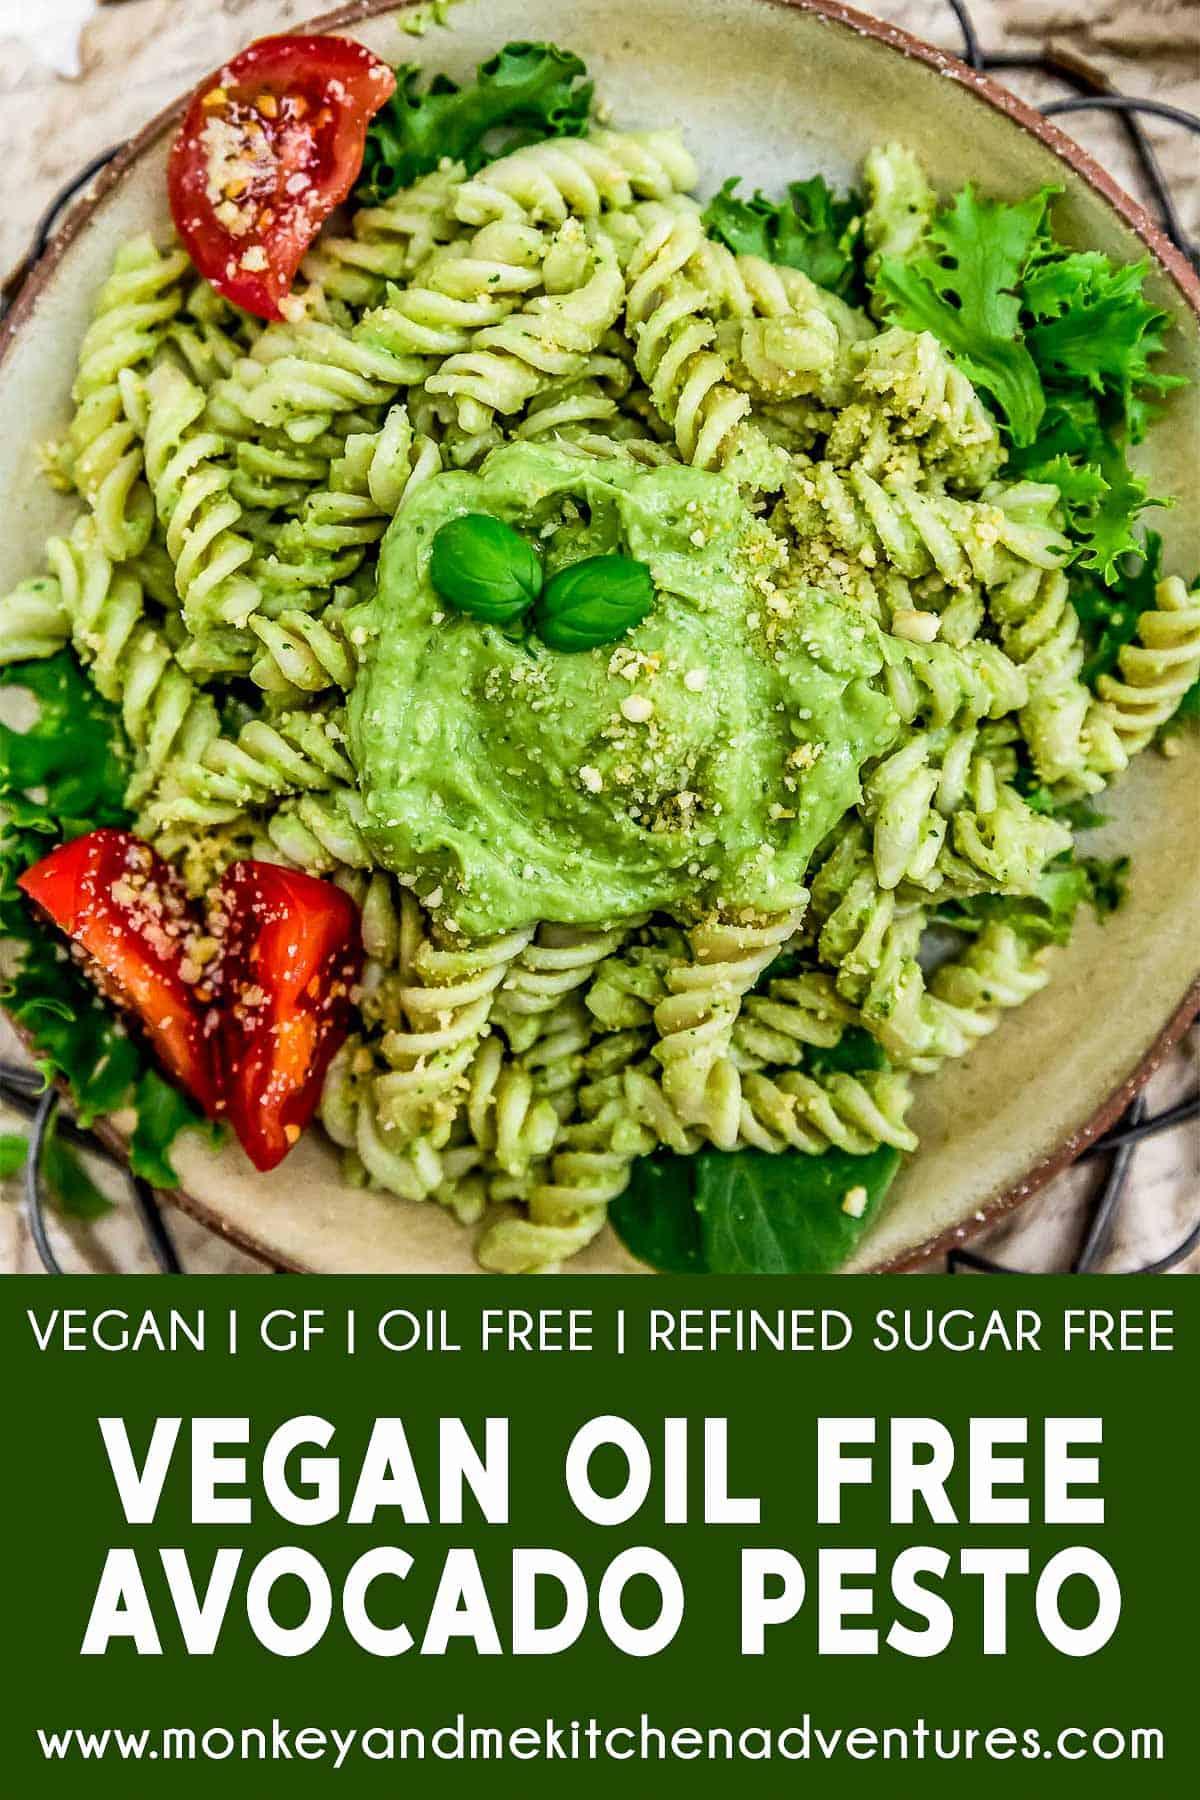 Vegan Oil Free Avocado Pesto with text description